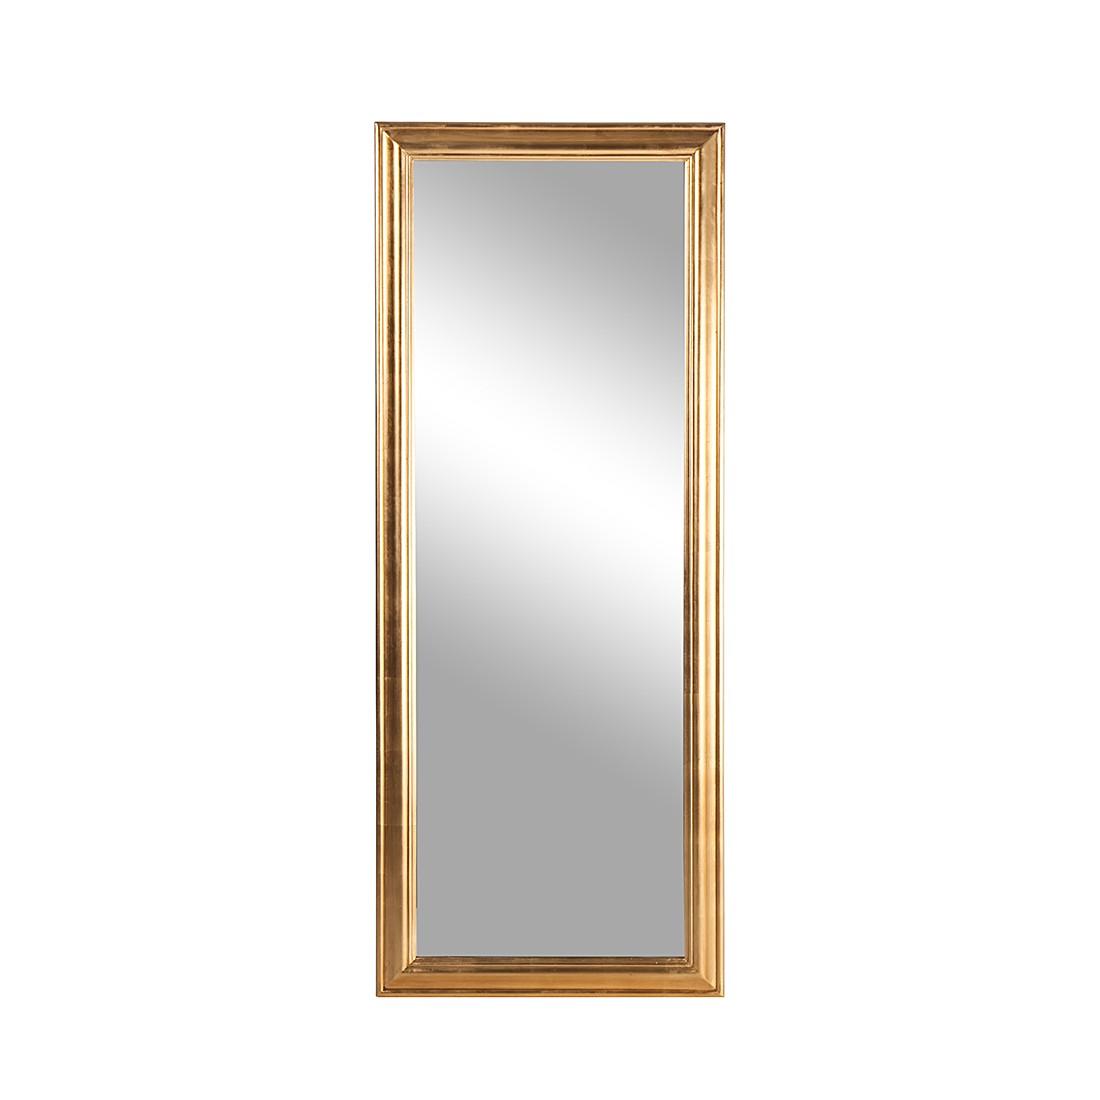 Spiegel Belleville - wandspiegel goud 60x150x7cm, Jack and Alice